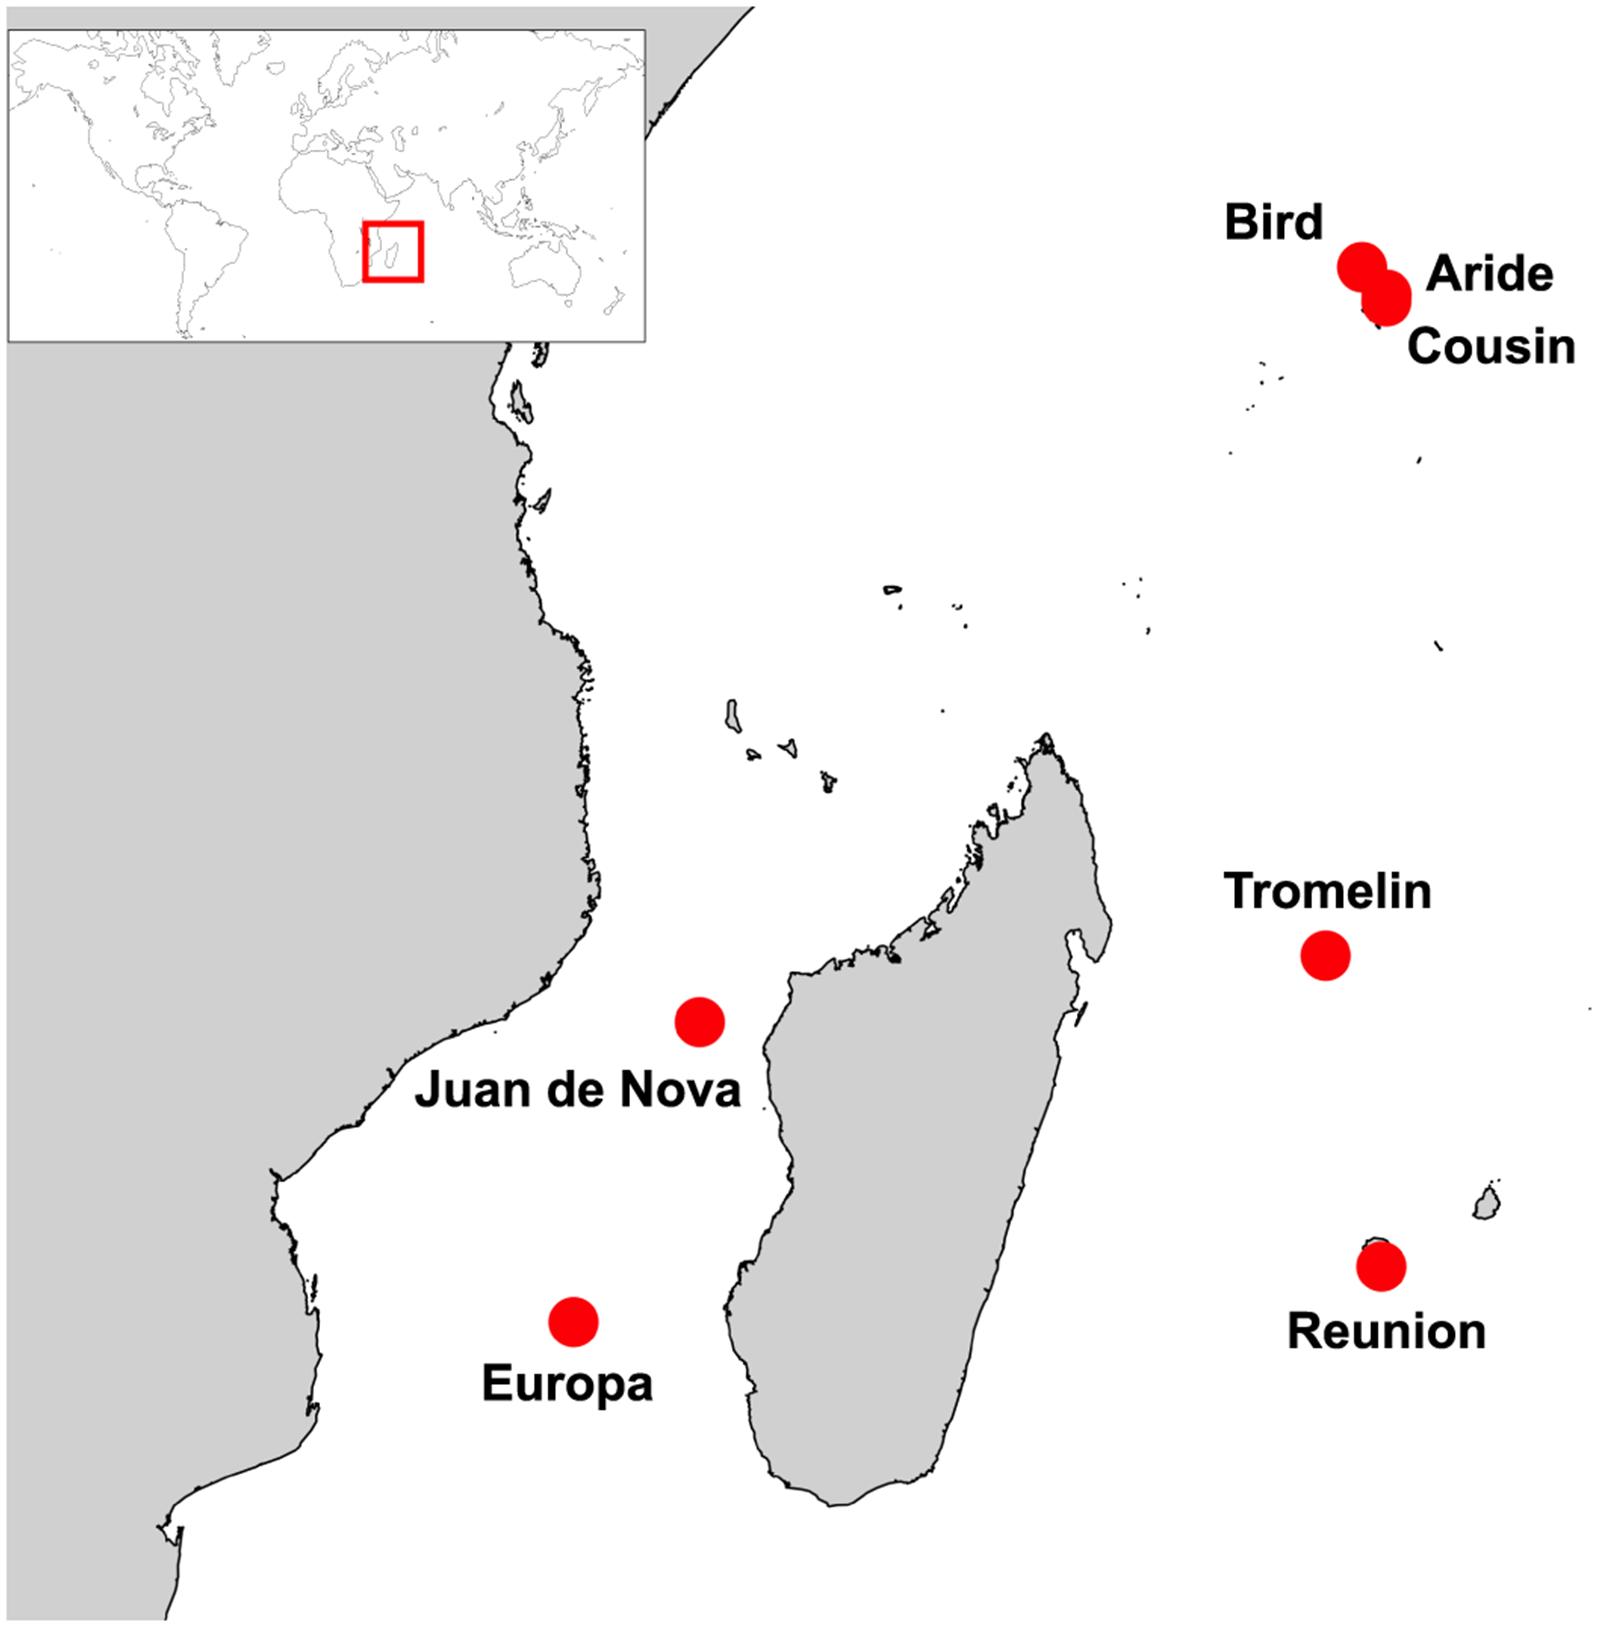 Sampling locations (red circles).